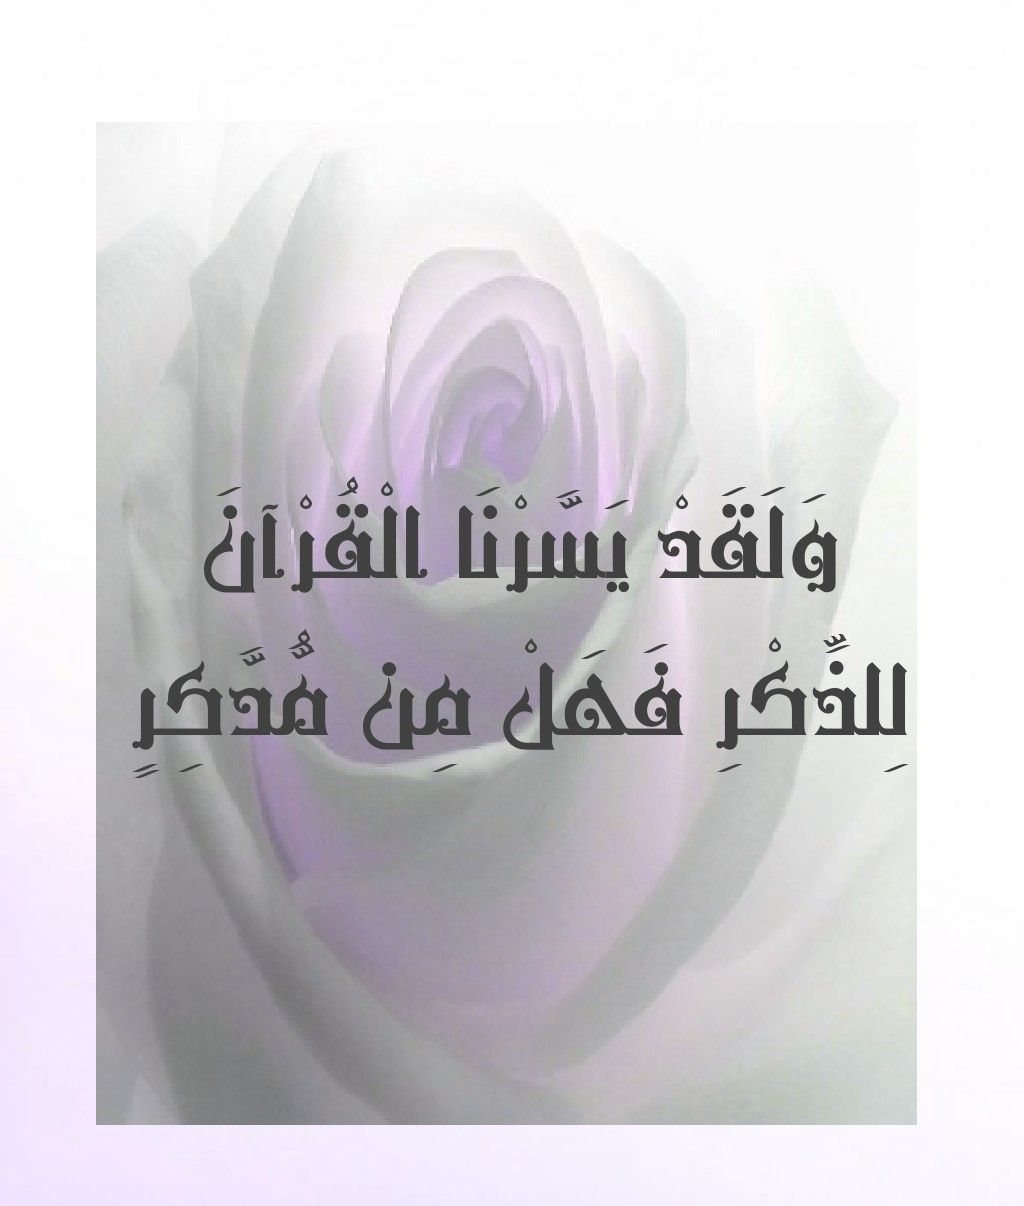 و ل ق د ي س ر ن ا ال ق ر آن ل لذ ك ر ف ه ل م ن م د ك ر Ramadan Kareem North Face Logo Retail Logos